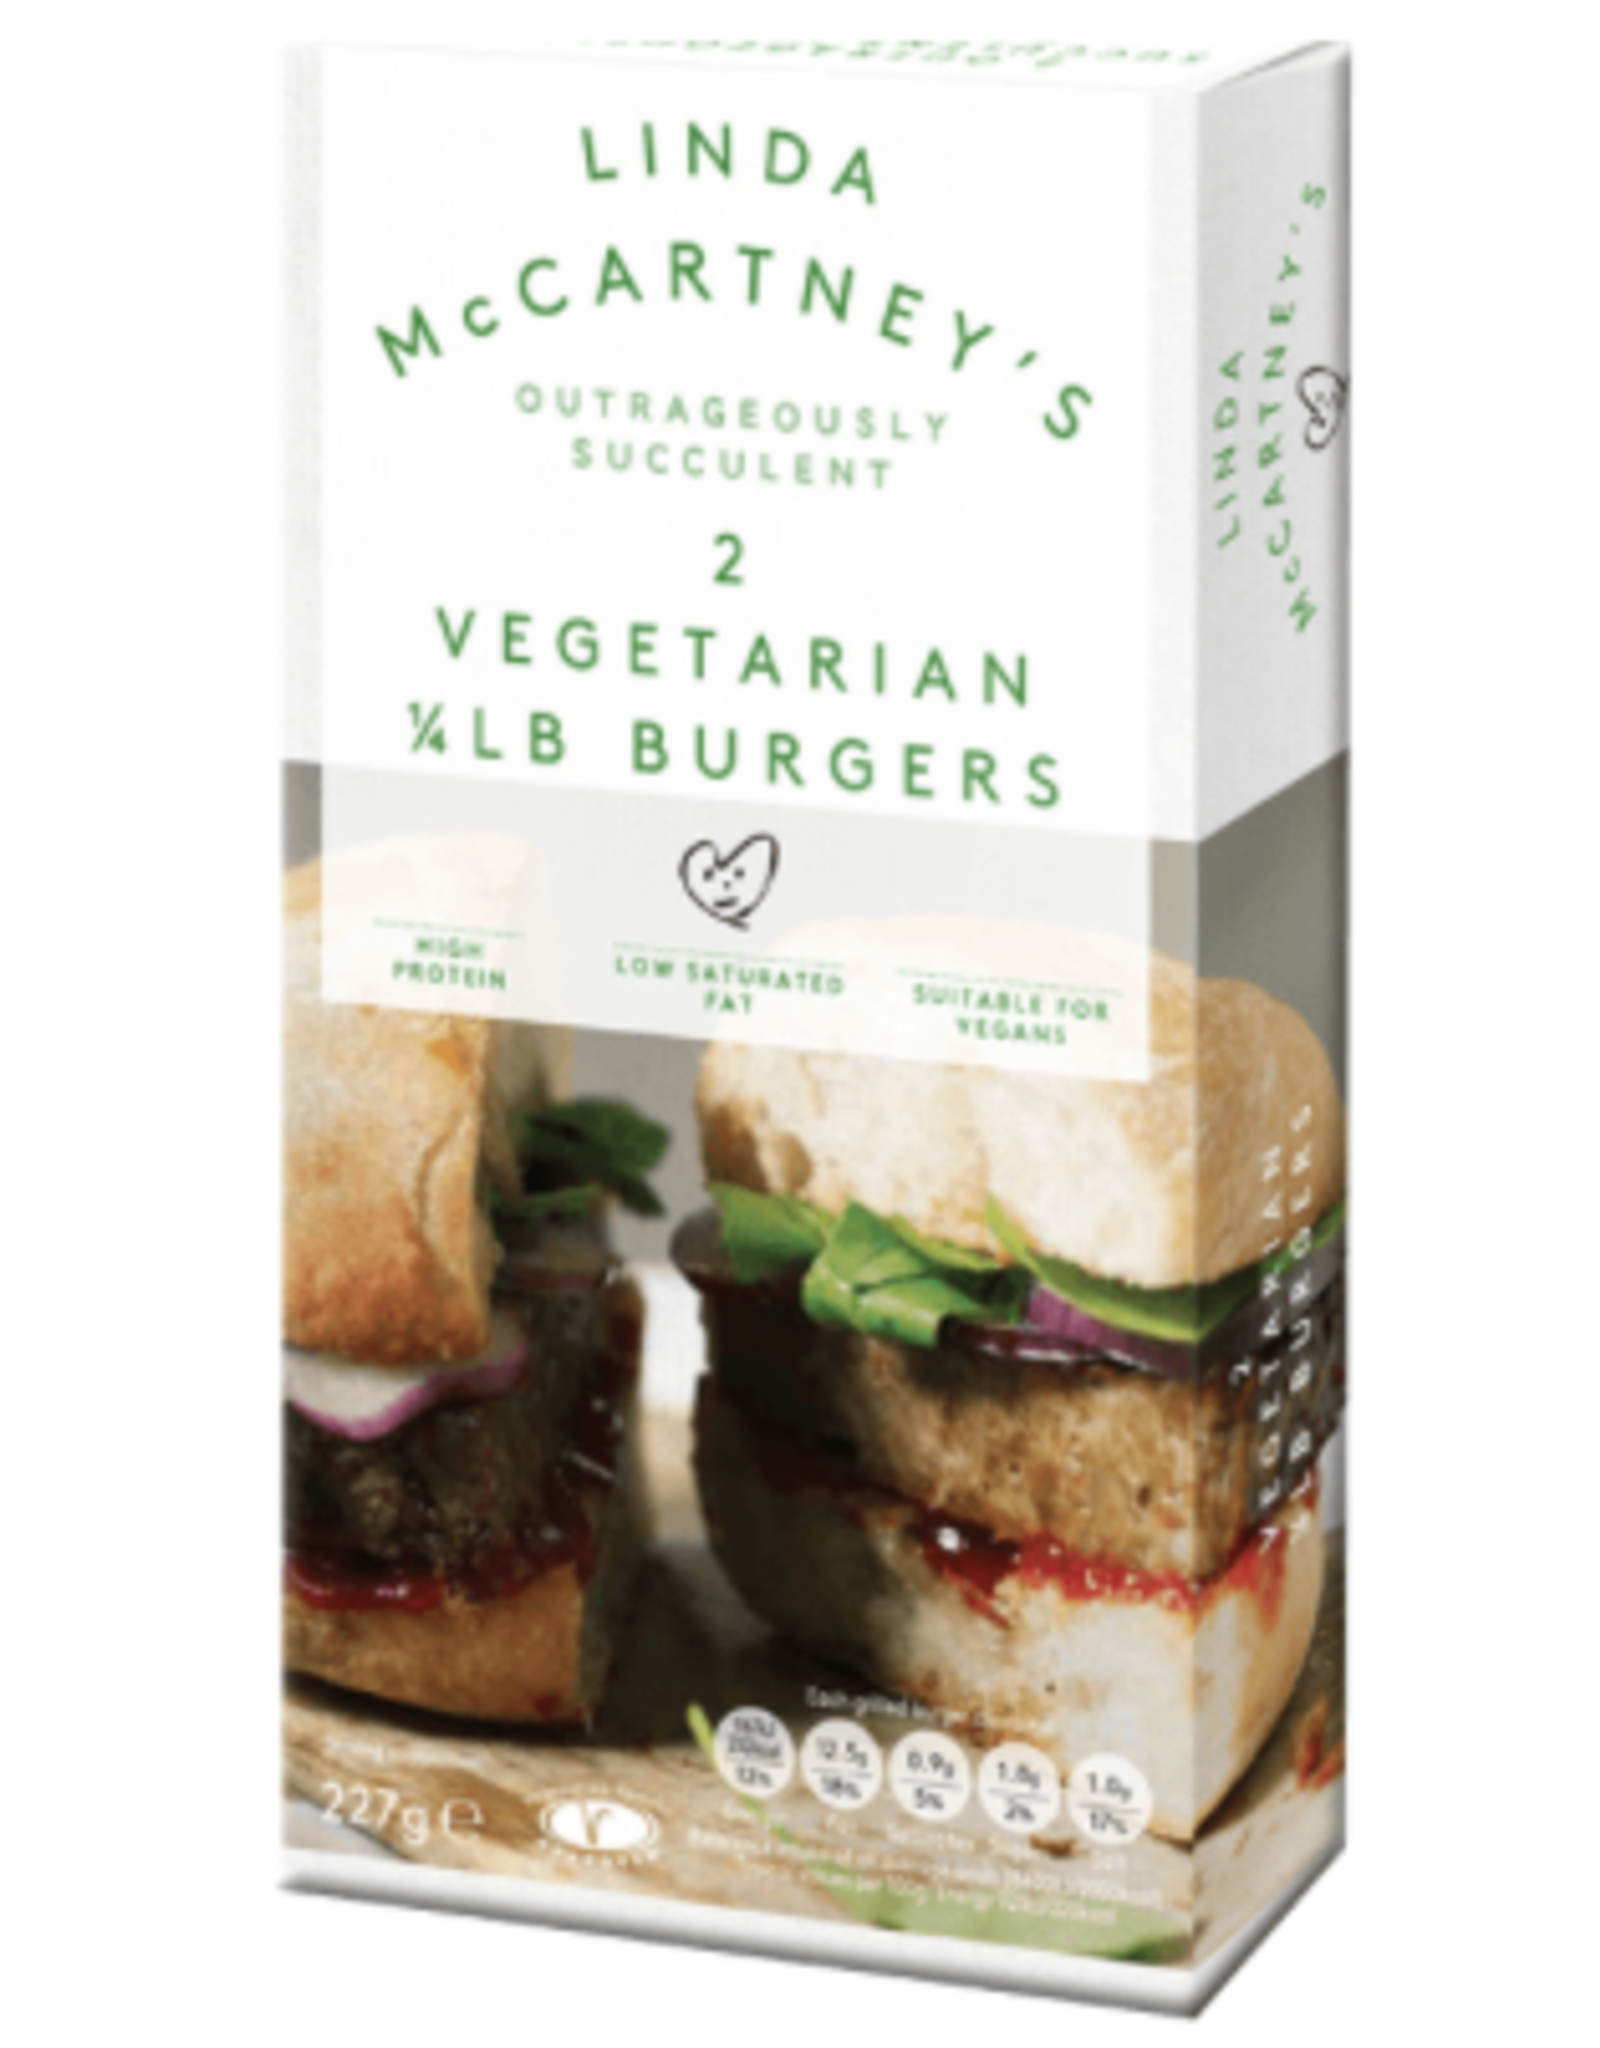 Linda Mccartney Hamburguesas Vegana Cuarto de Libra, 227g